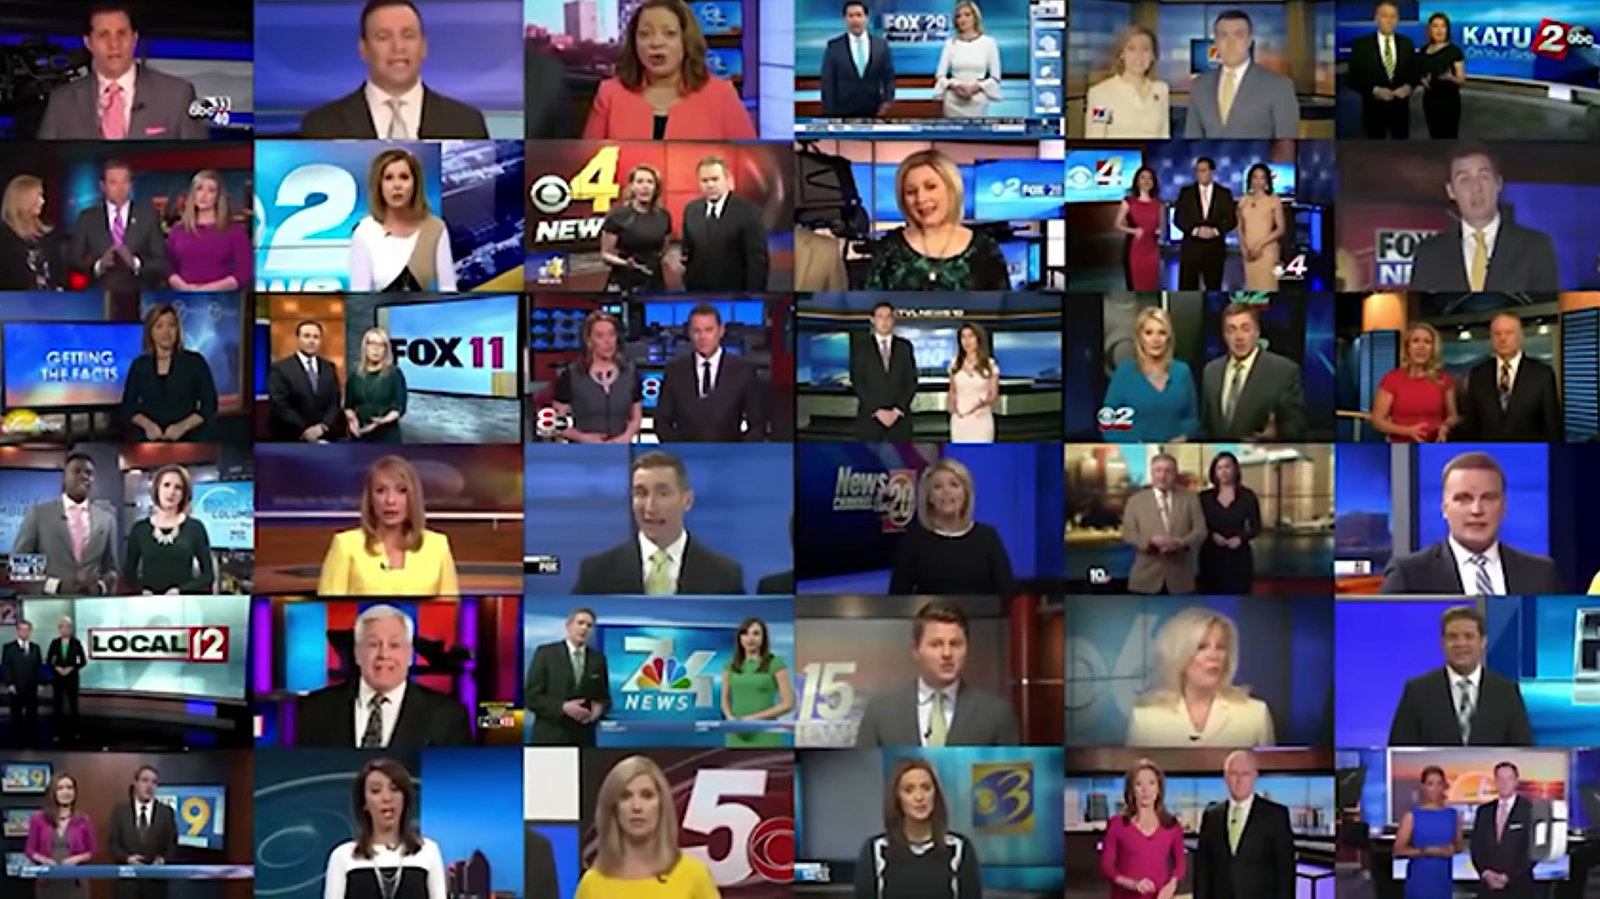 Sinclair Made Dozens of Local News Anchors Recite the Same Script - The New York Times